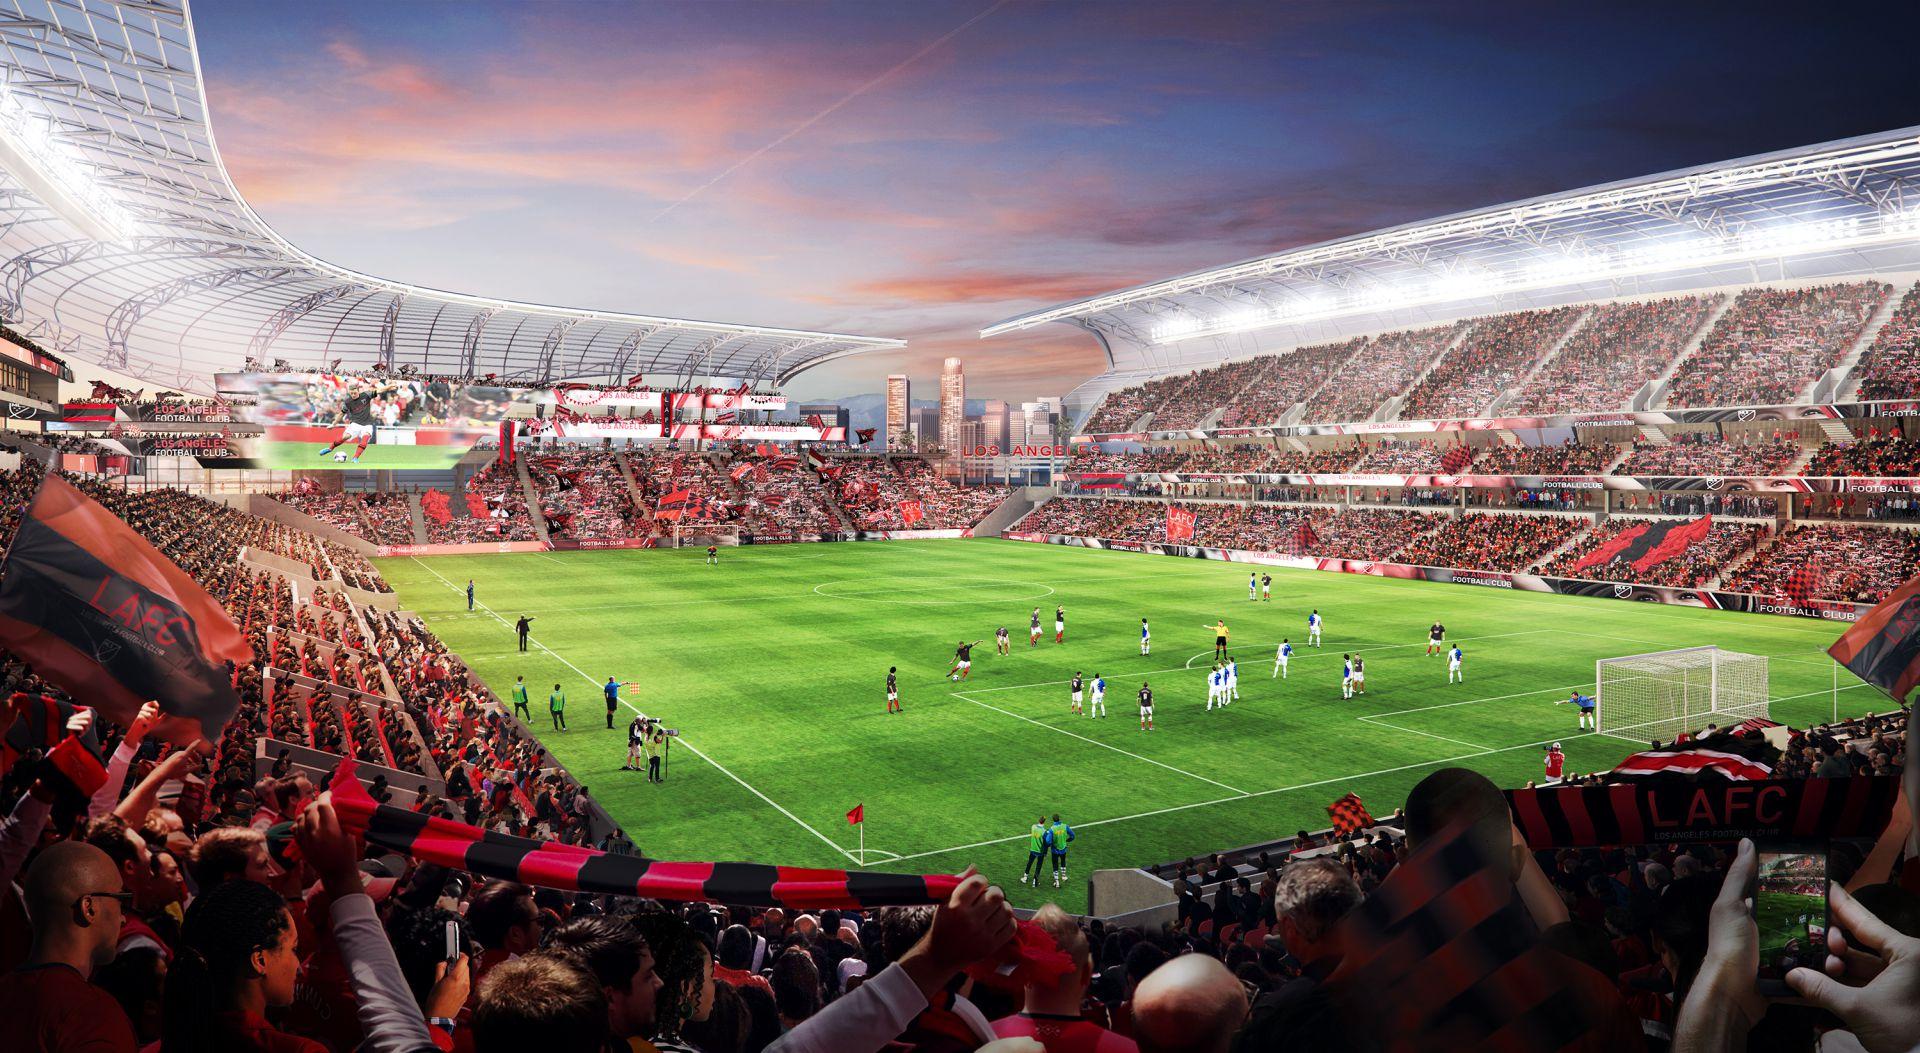 Design Banc Of California Stadium Stadiumdb Com